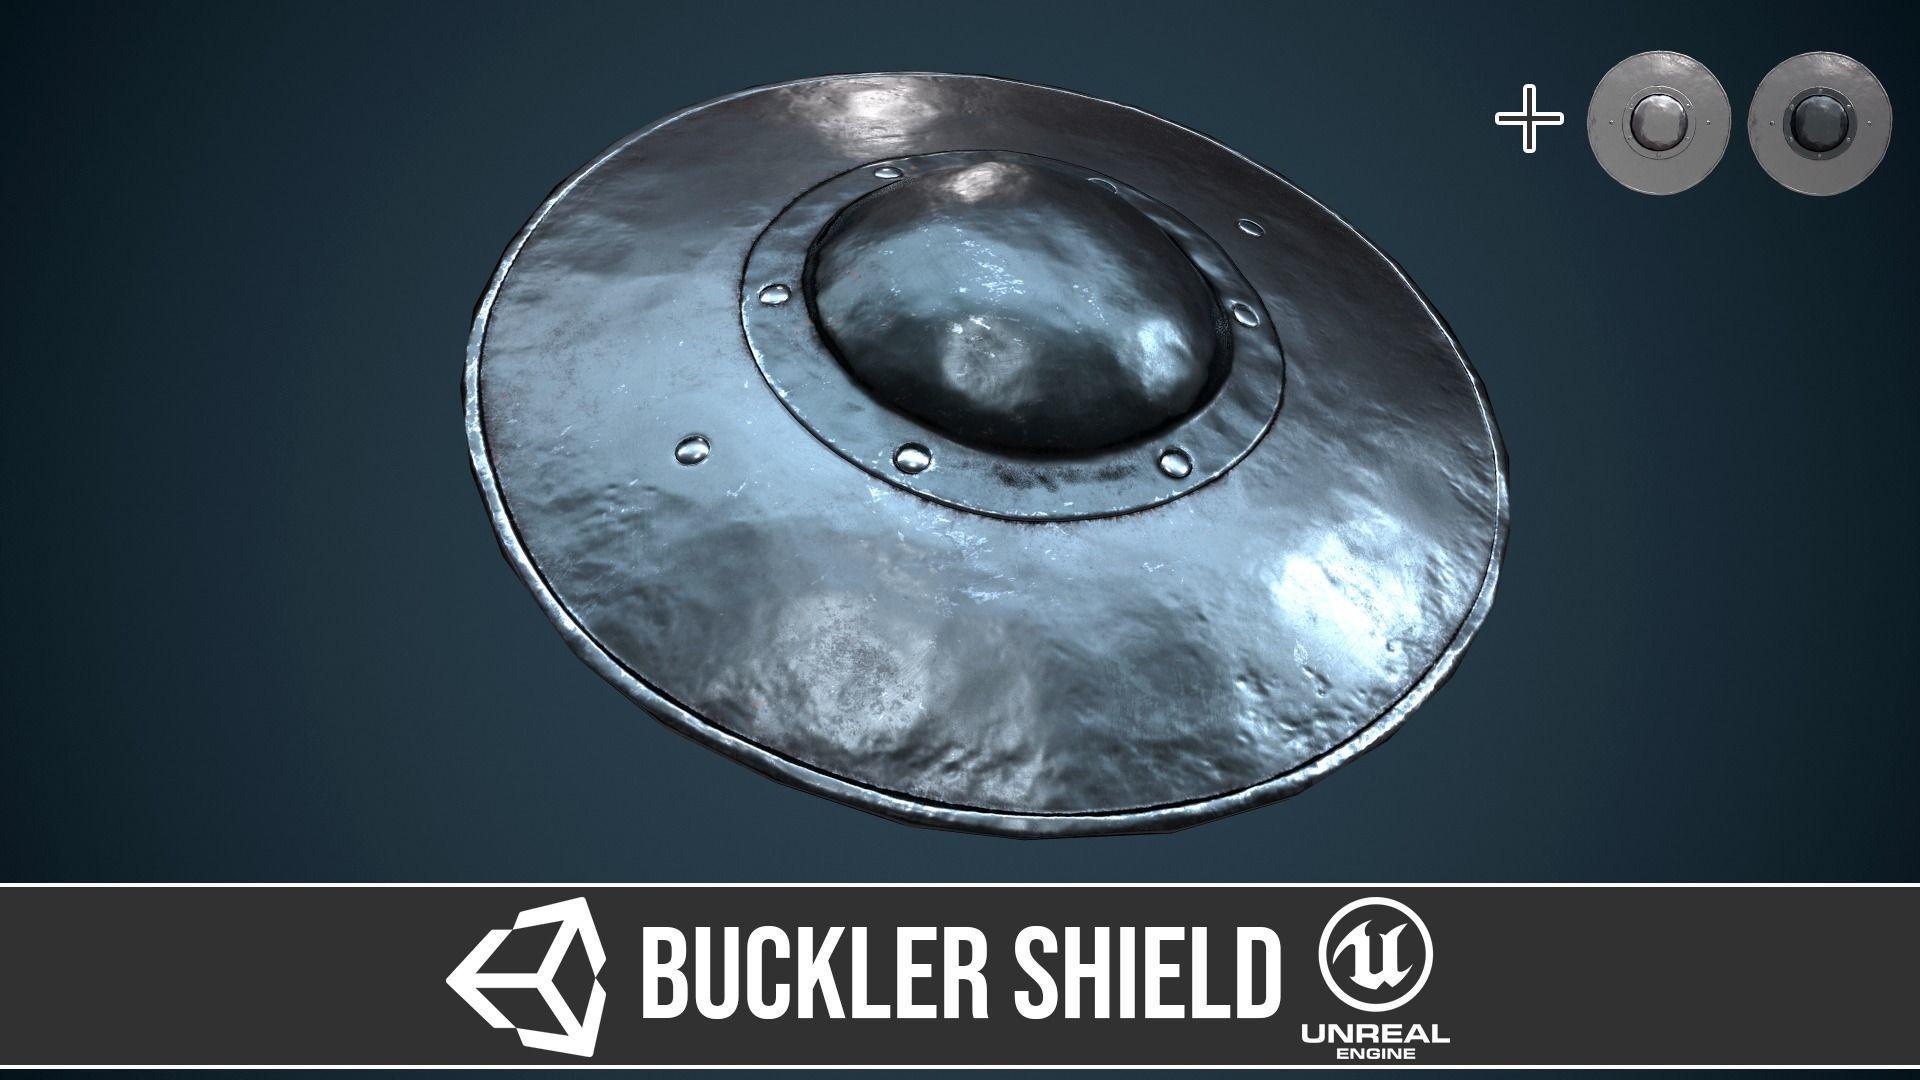 Buckler shield 1